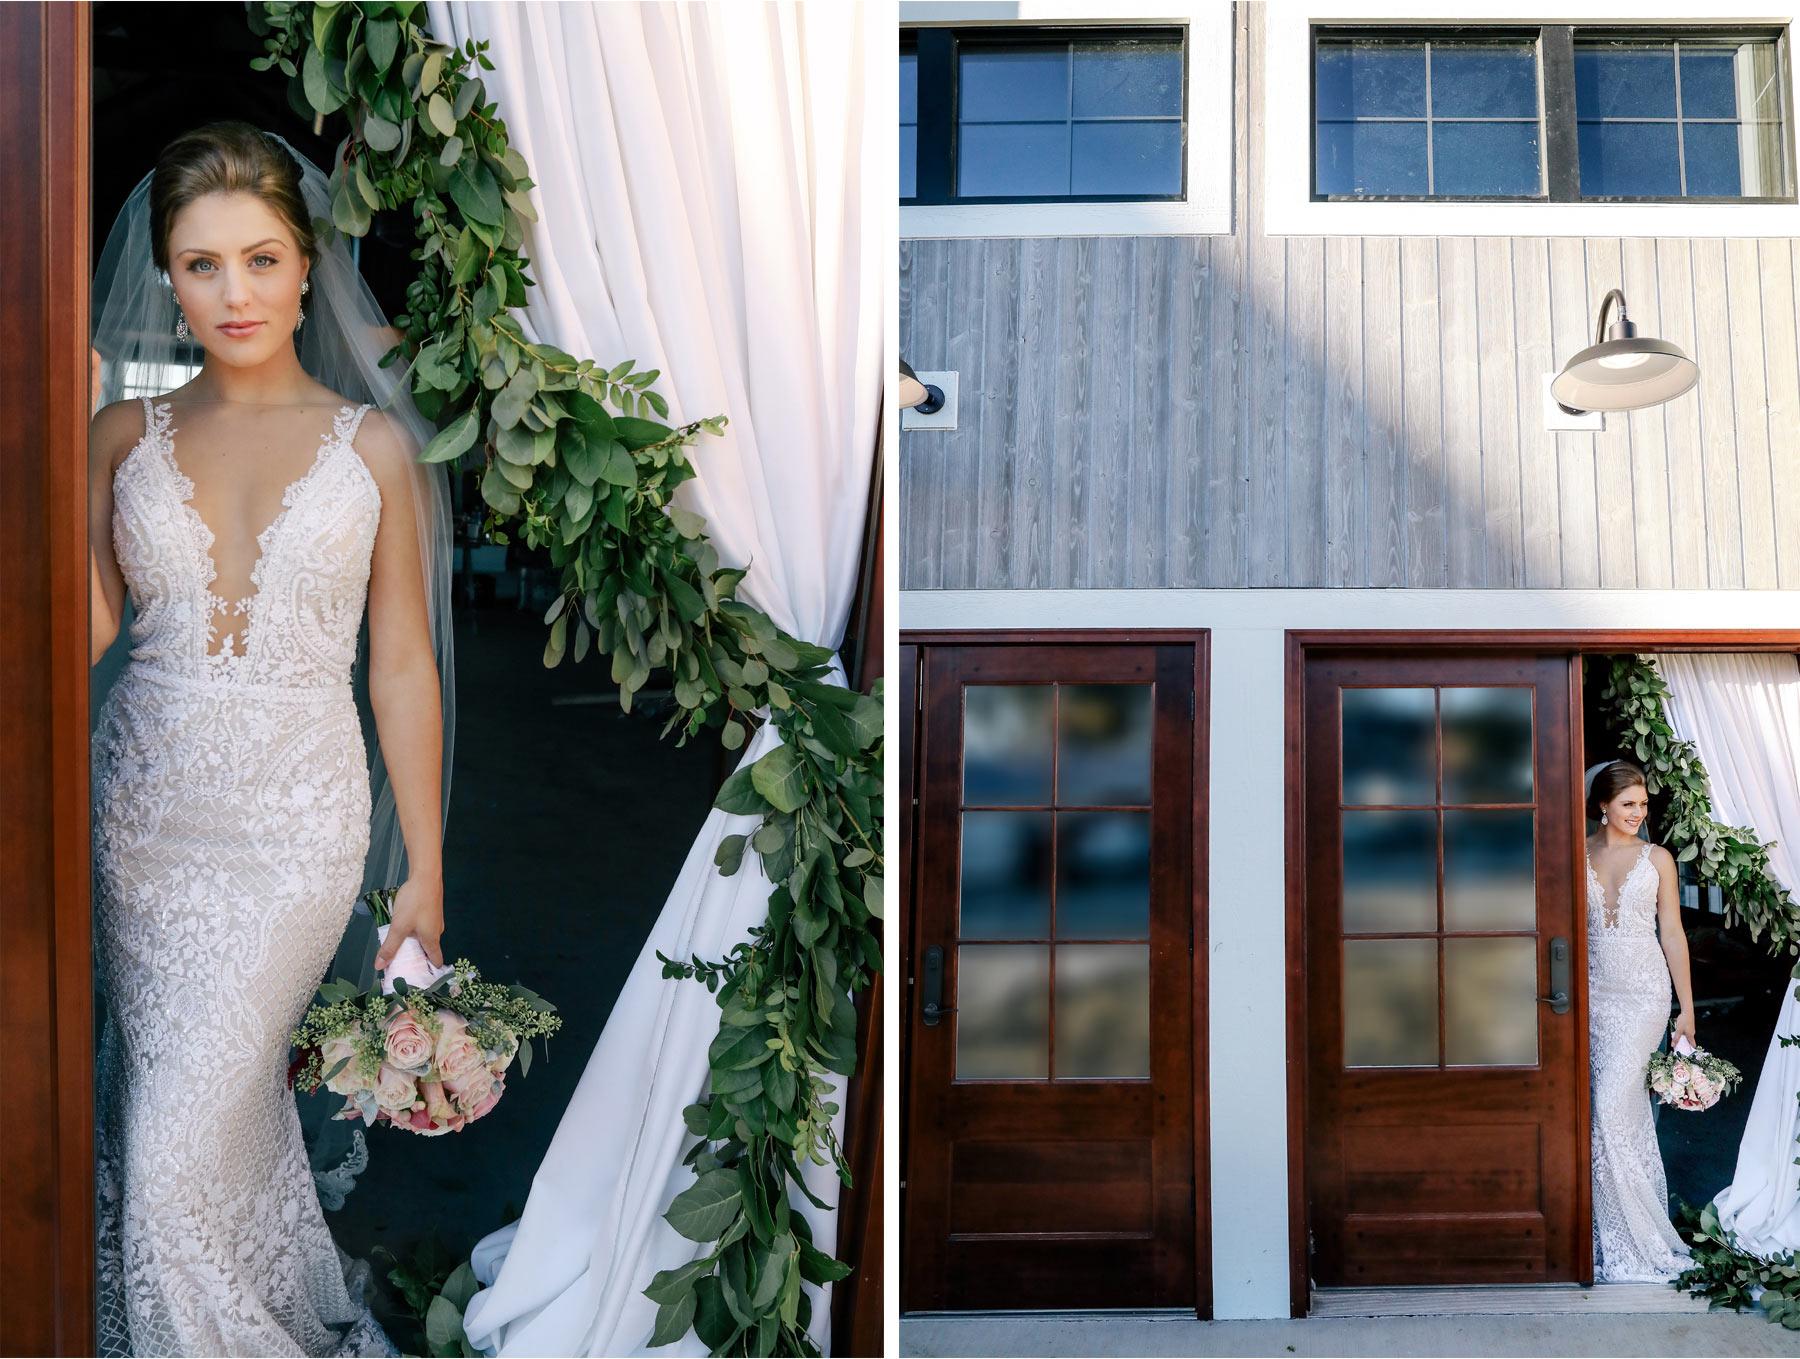 12-Ashery-Lane-Farm-Minneapolis-Minnesota-Wedding-Styled-Shoot-New-Venue-Barn-Orchard-Vineyard.jpg